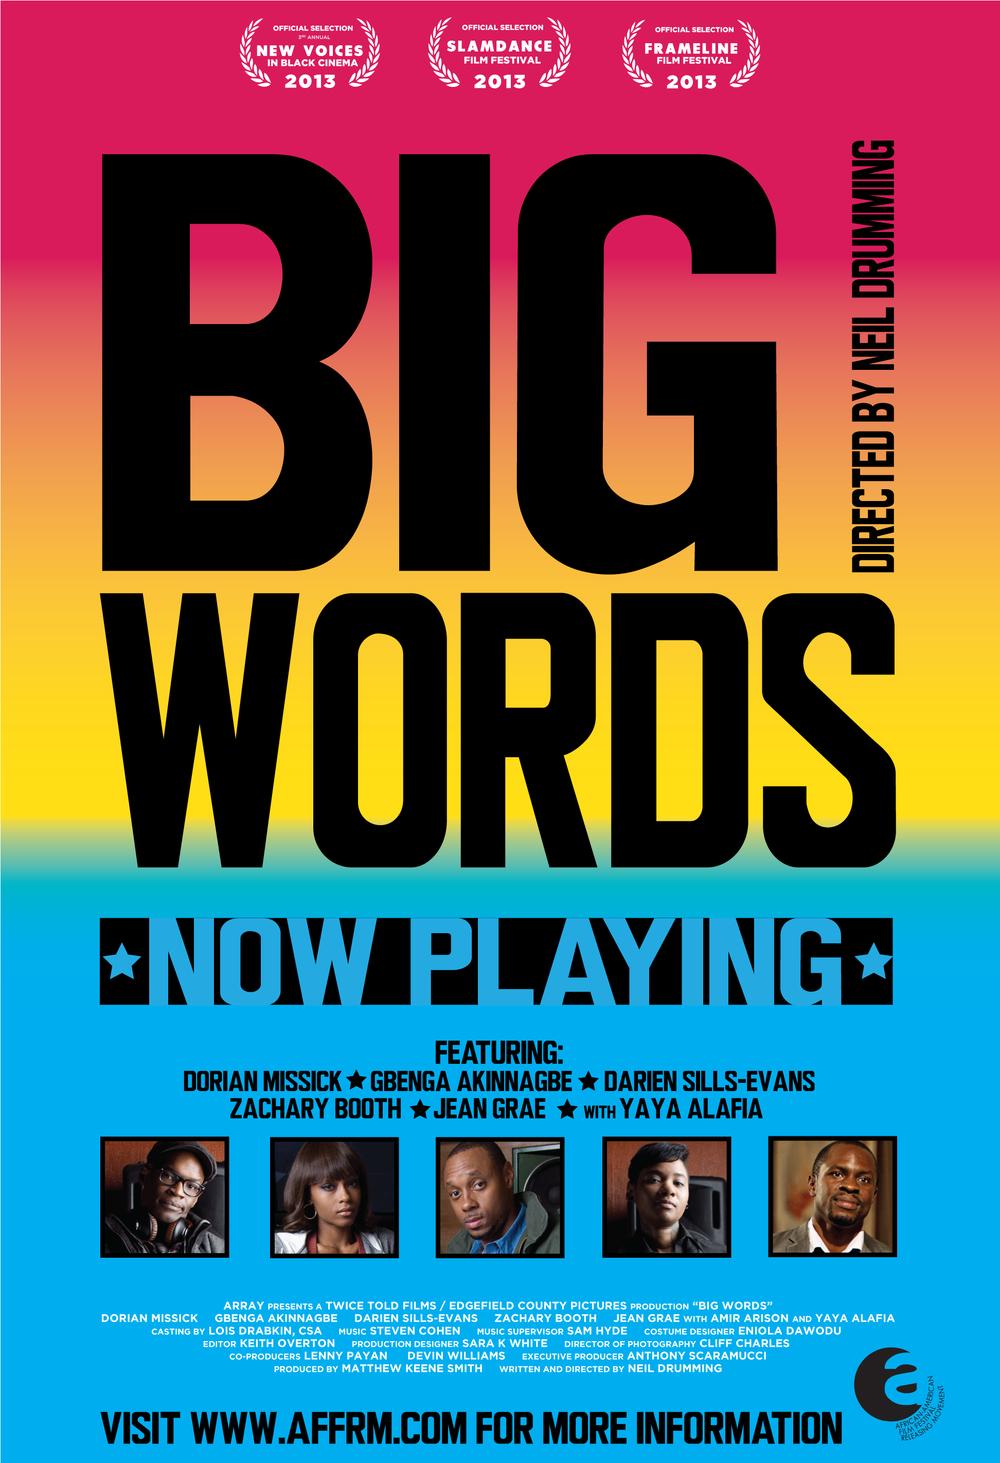 BIG WORDS